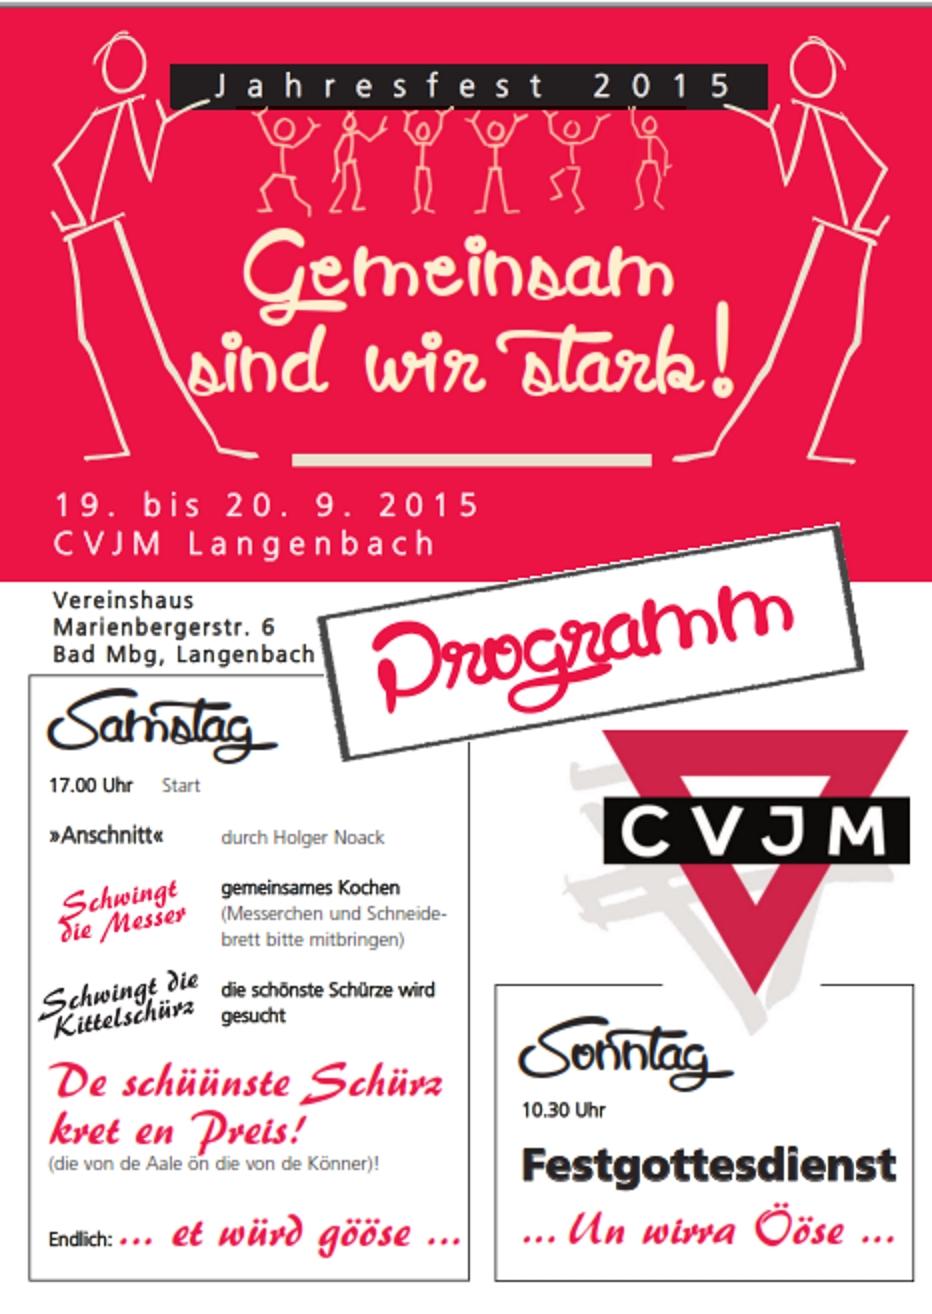 Flyer CVJM Jahresfest 2015